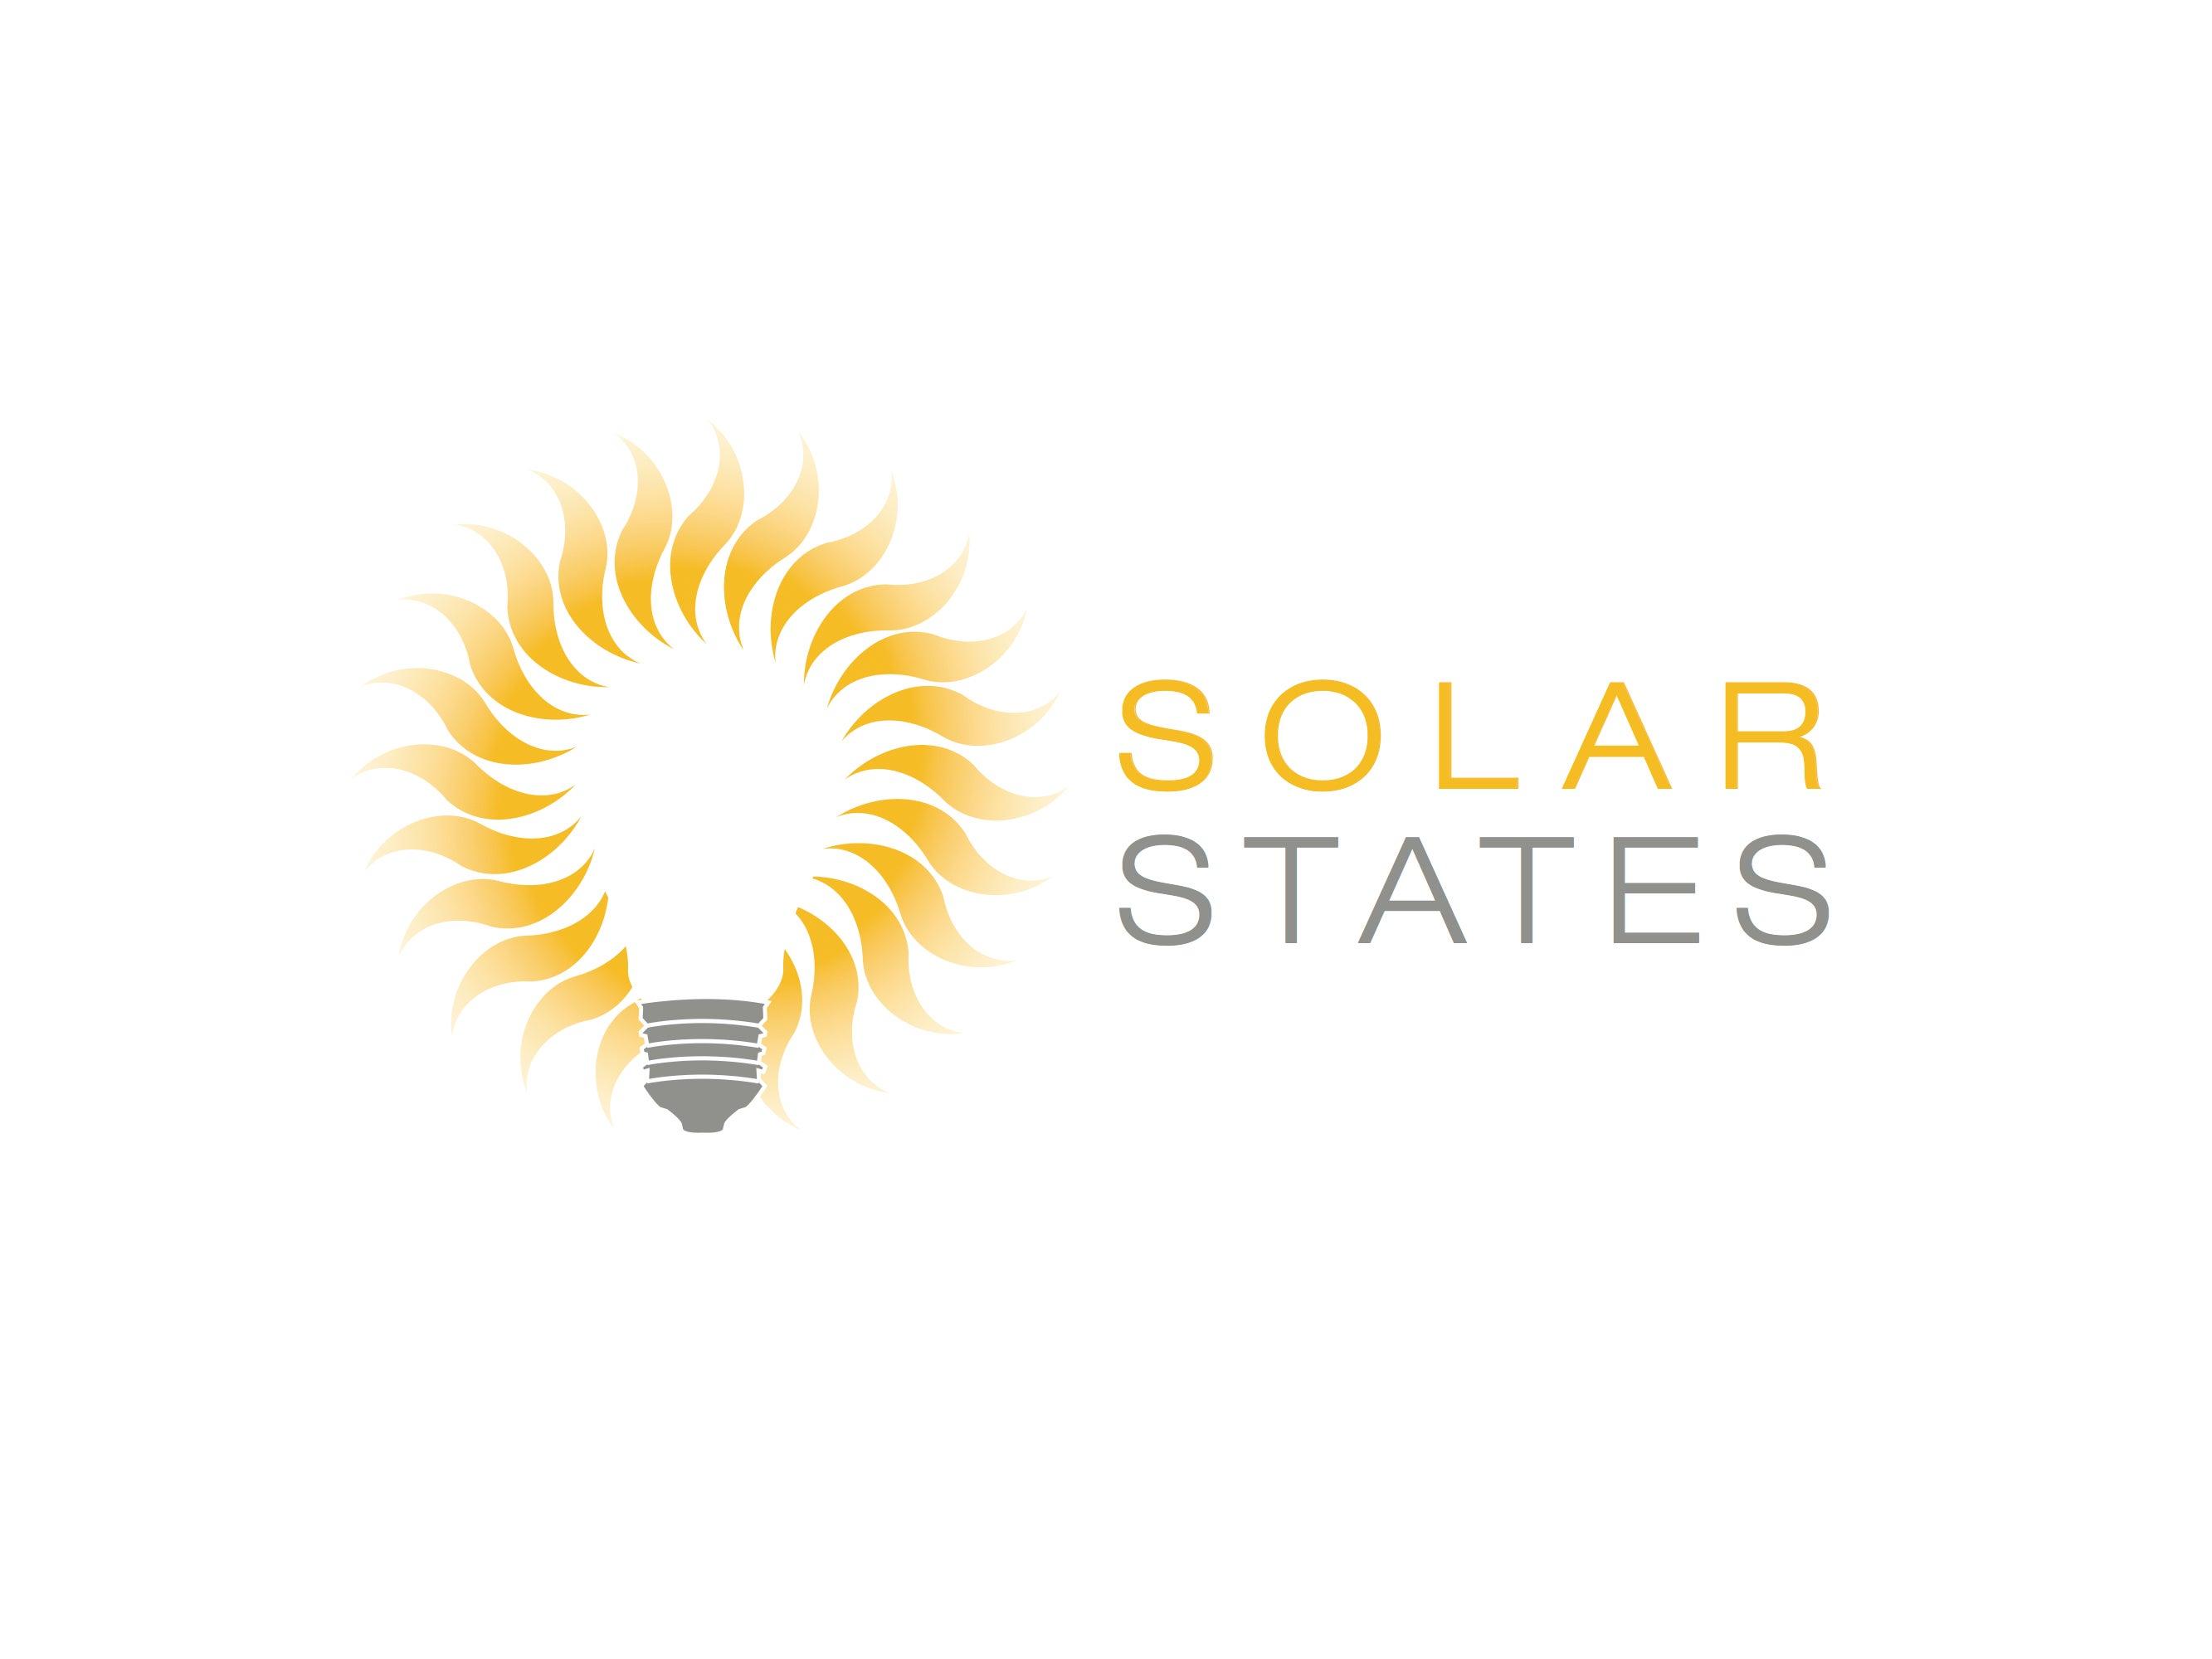 Vivint solar reviews california - Solar States Reviews Solar States Cost Solar States Solar Panels Locations And Complaints